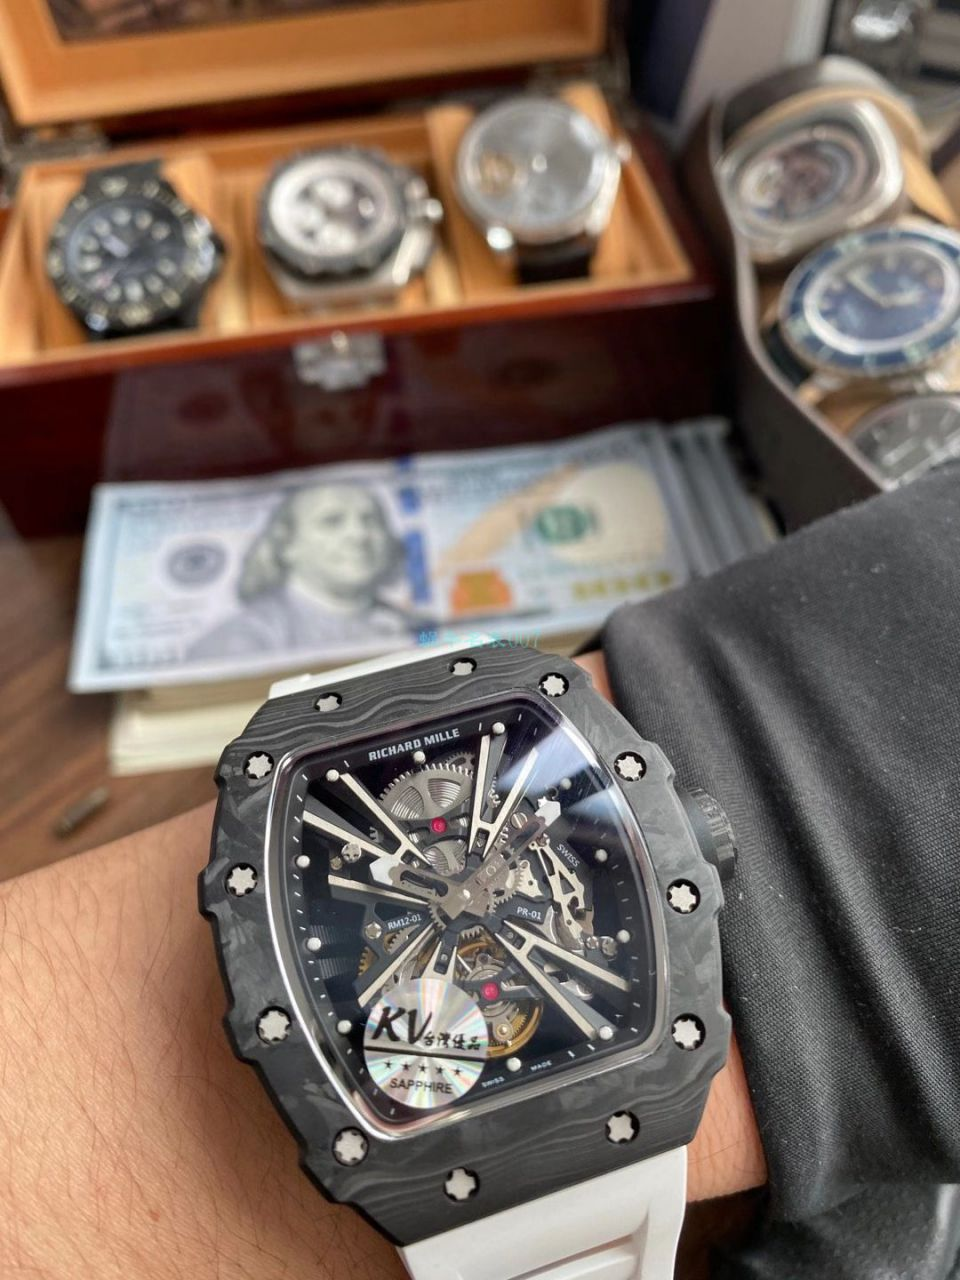 KV厂RICHARD MILLE 理查德米勒RM 12-01 限量陀飞轮一比一顶级复刻手表 / RM12-01KV